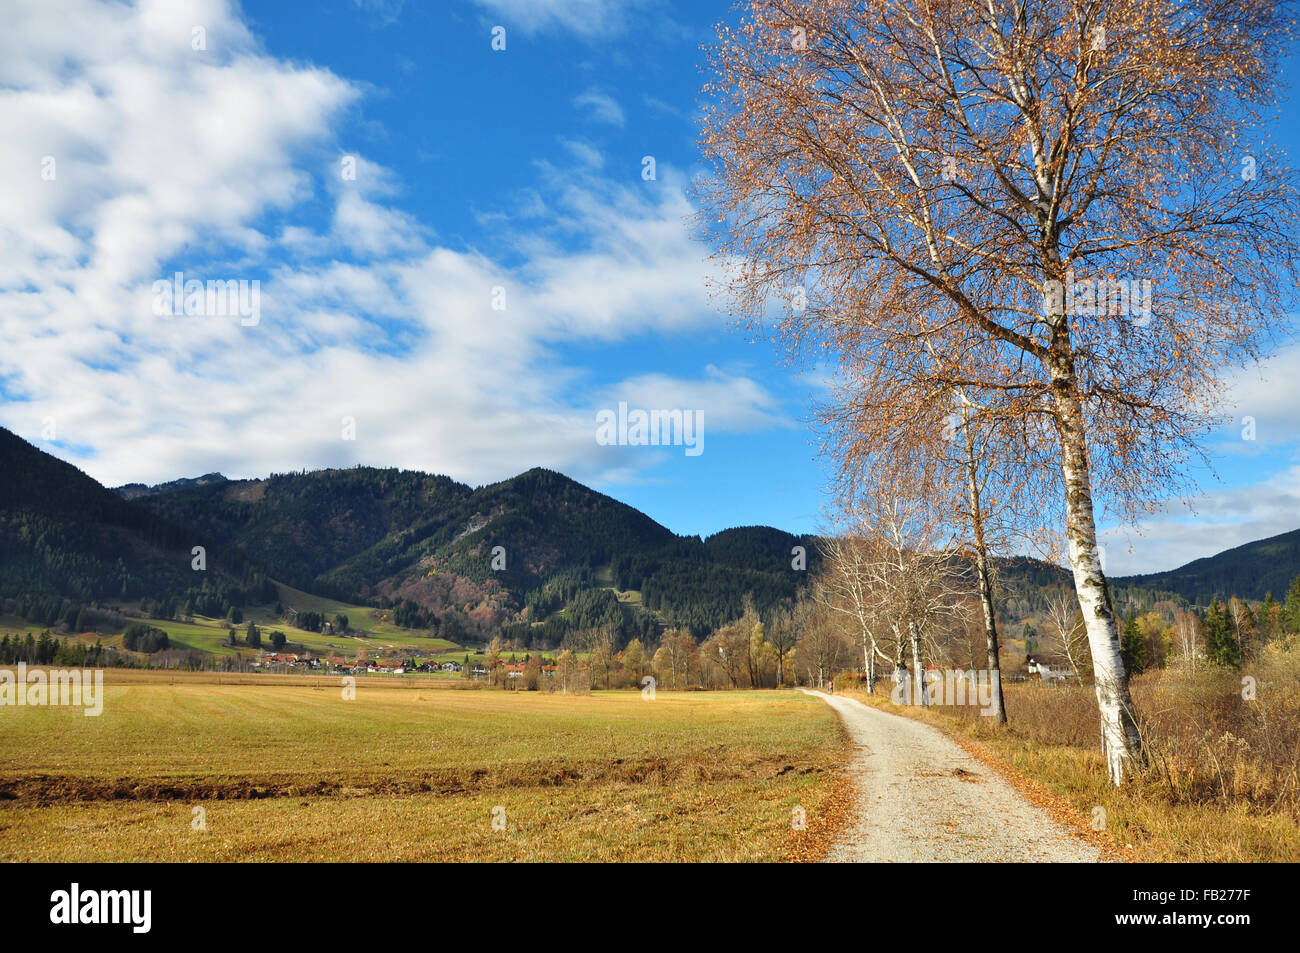 Stunning landscape in Oberammergau, Upper Bavaria, Germany - Stock Image